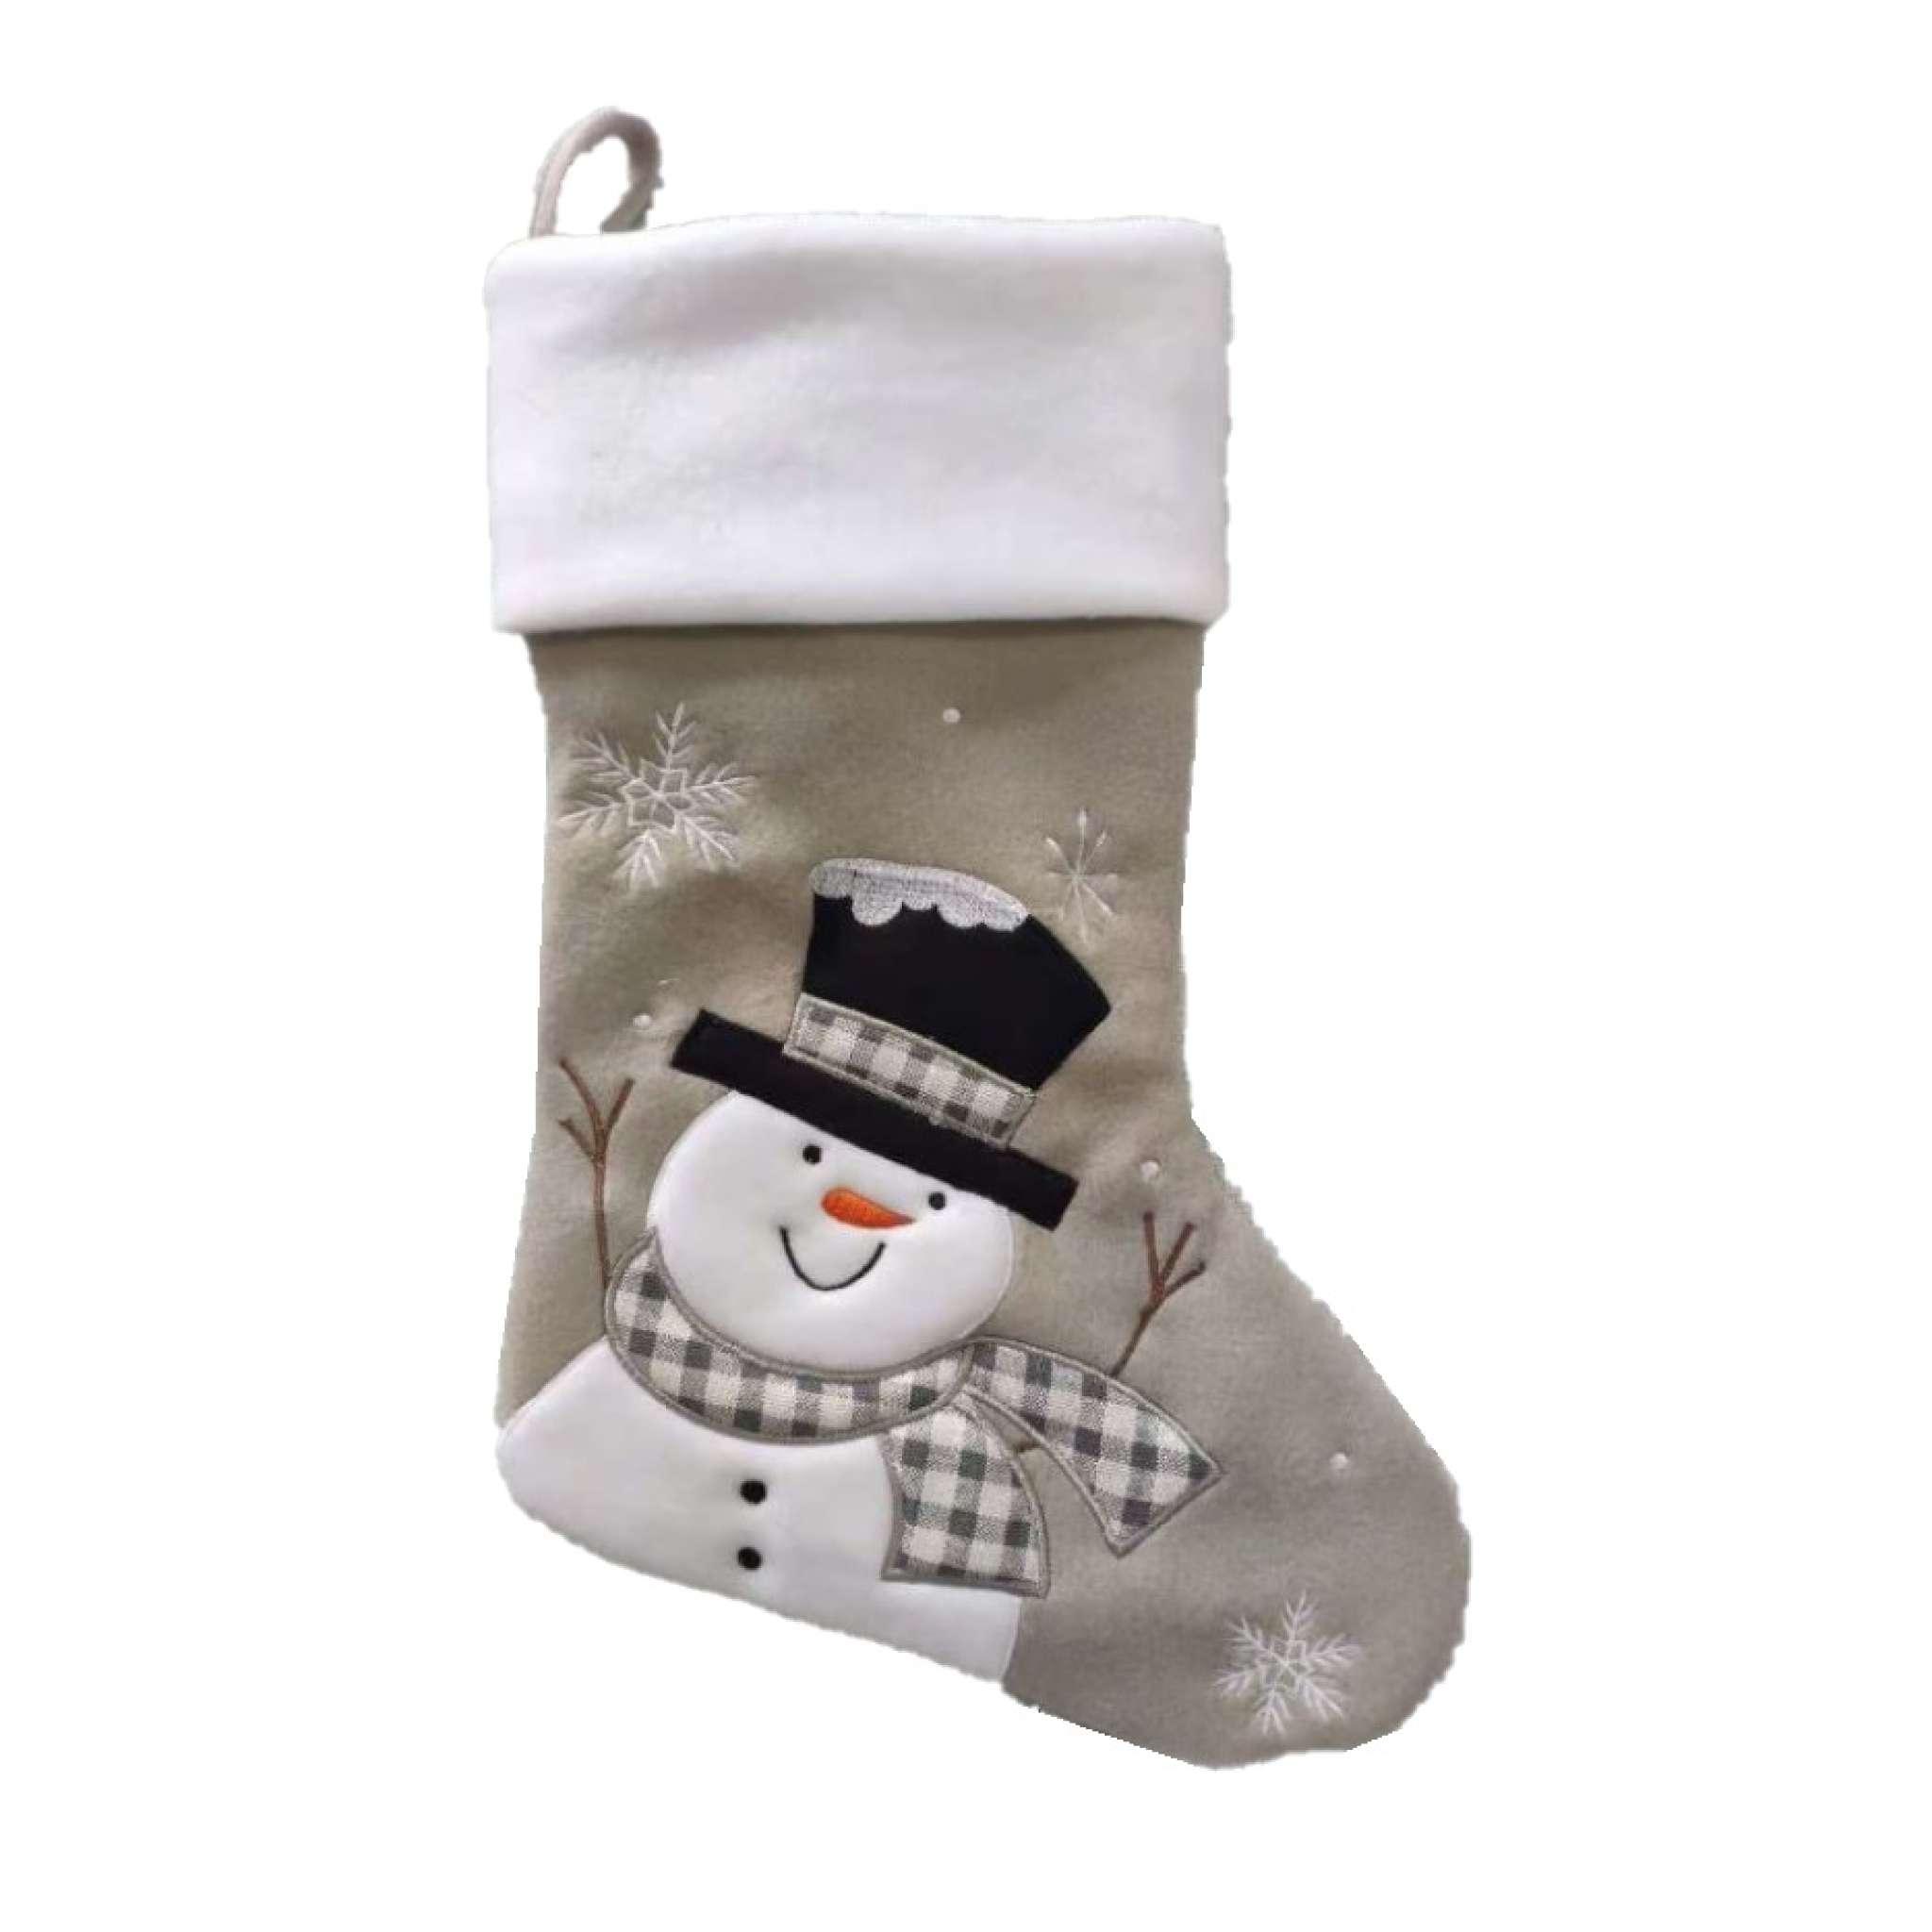 Julstrumpa Premium, Snögubbe, Vit